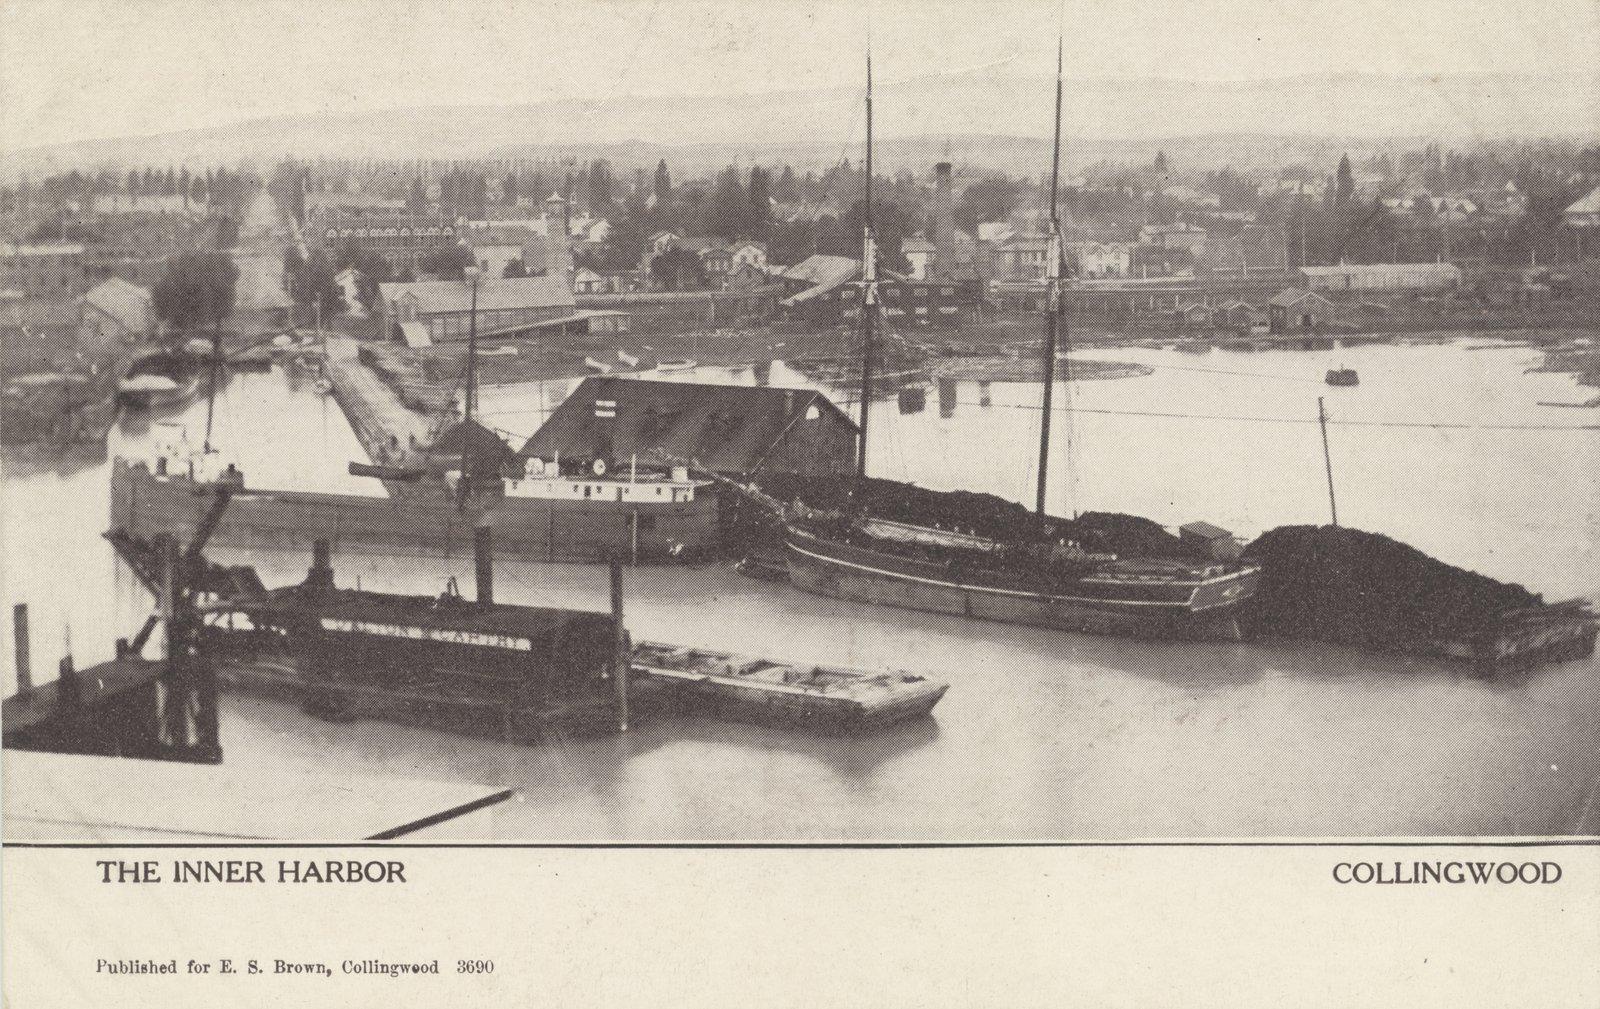 The Inner Harbor Collingwood